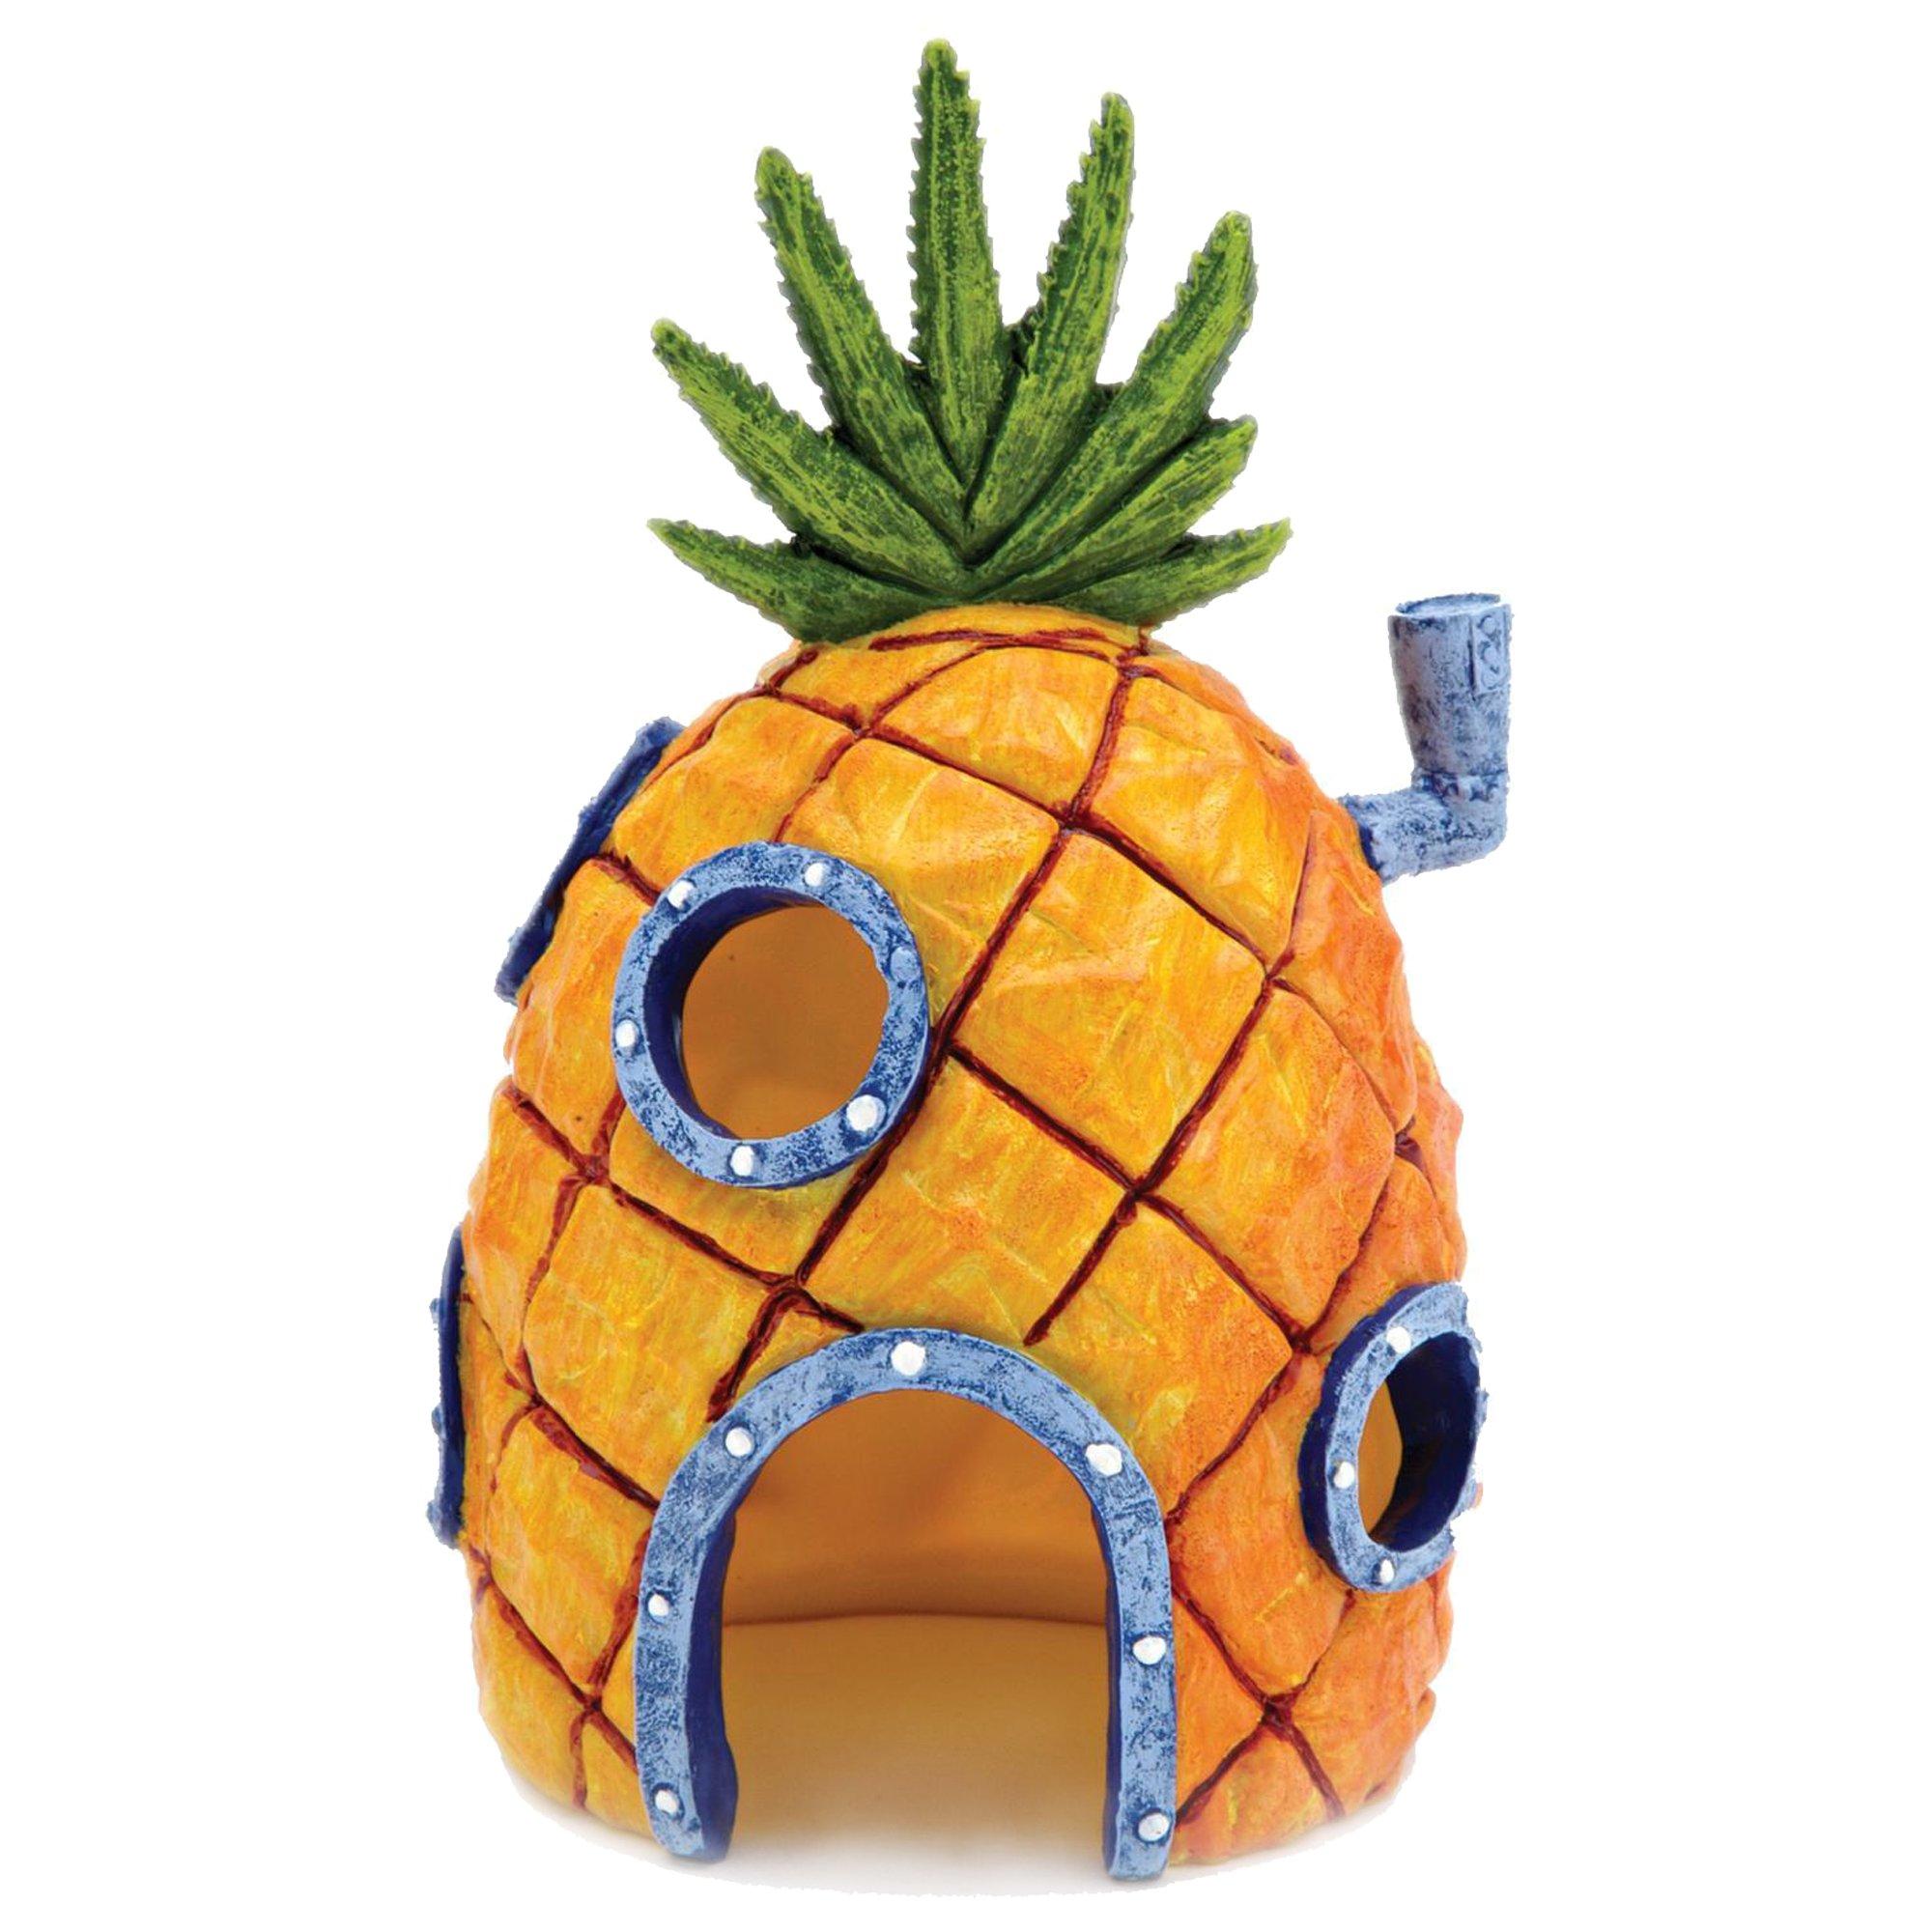 Penn Plax Spongebob Squarepants Pineapple House With Swim